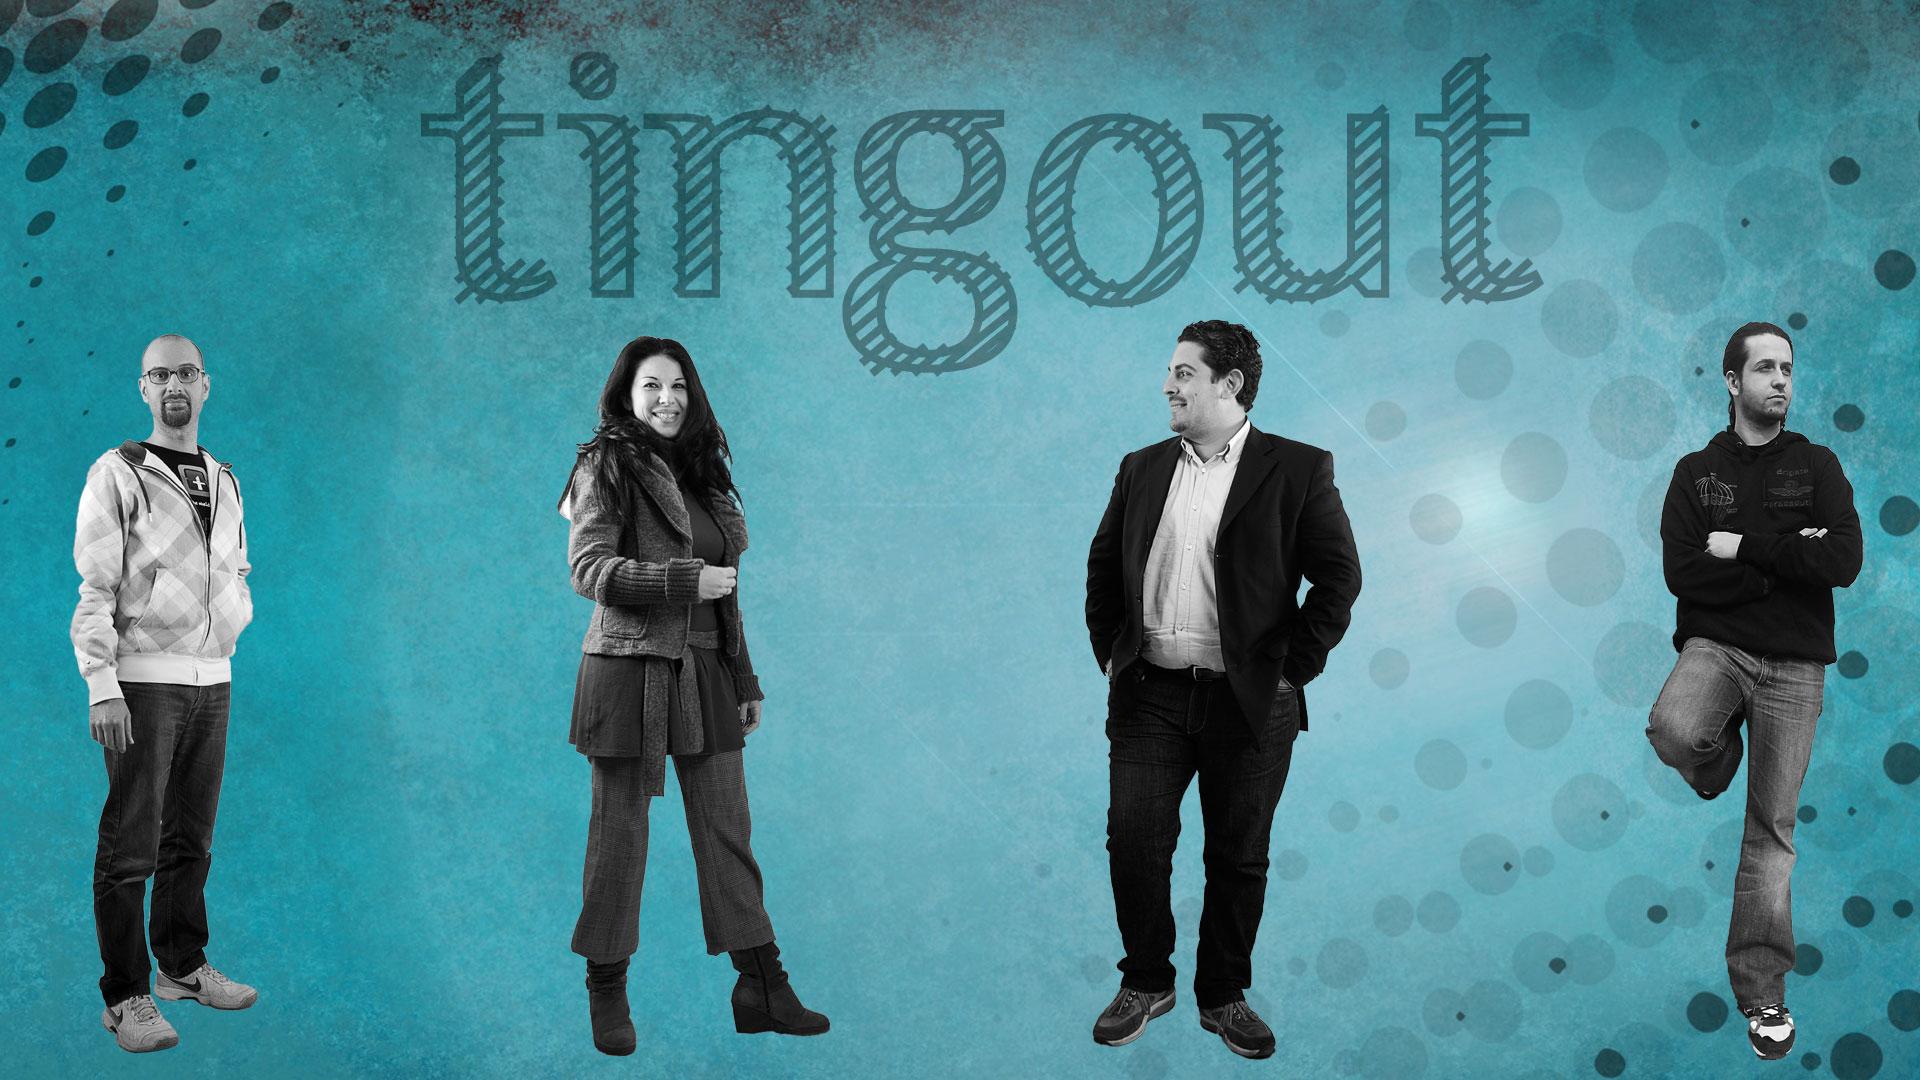 Team tingout